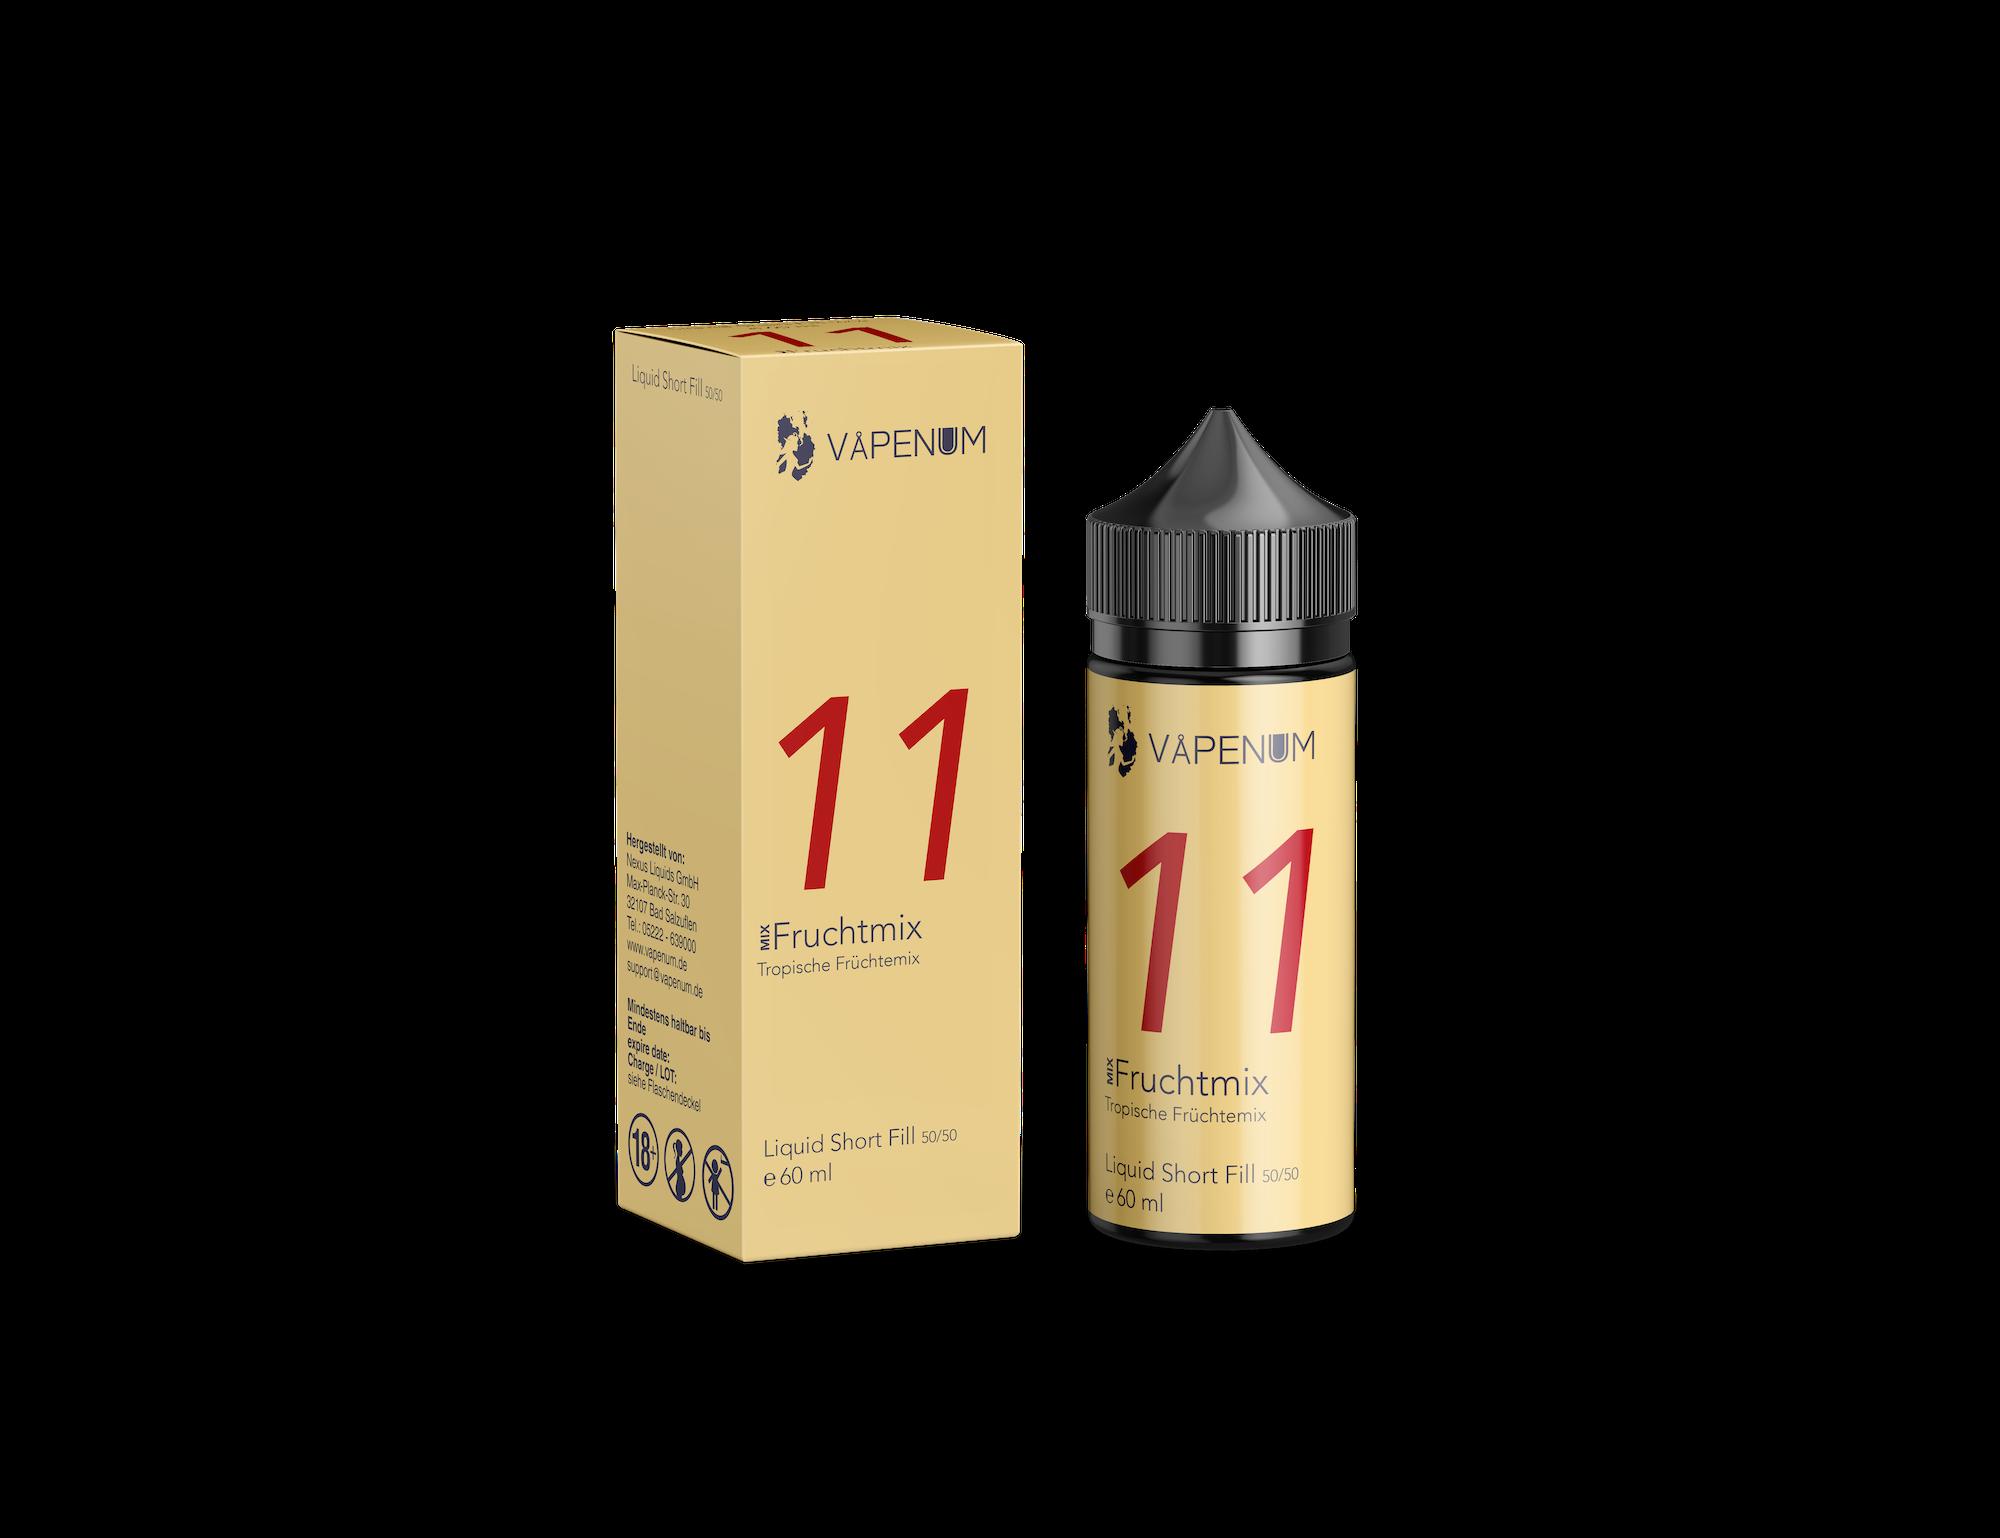 Vapenum Shortfill Mix 11 Fruchtmix